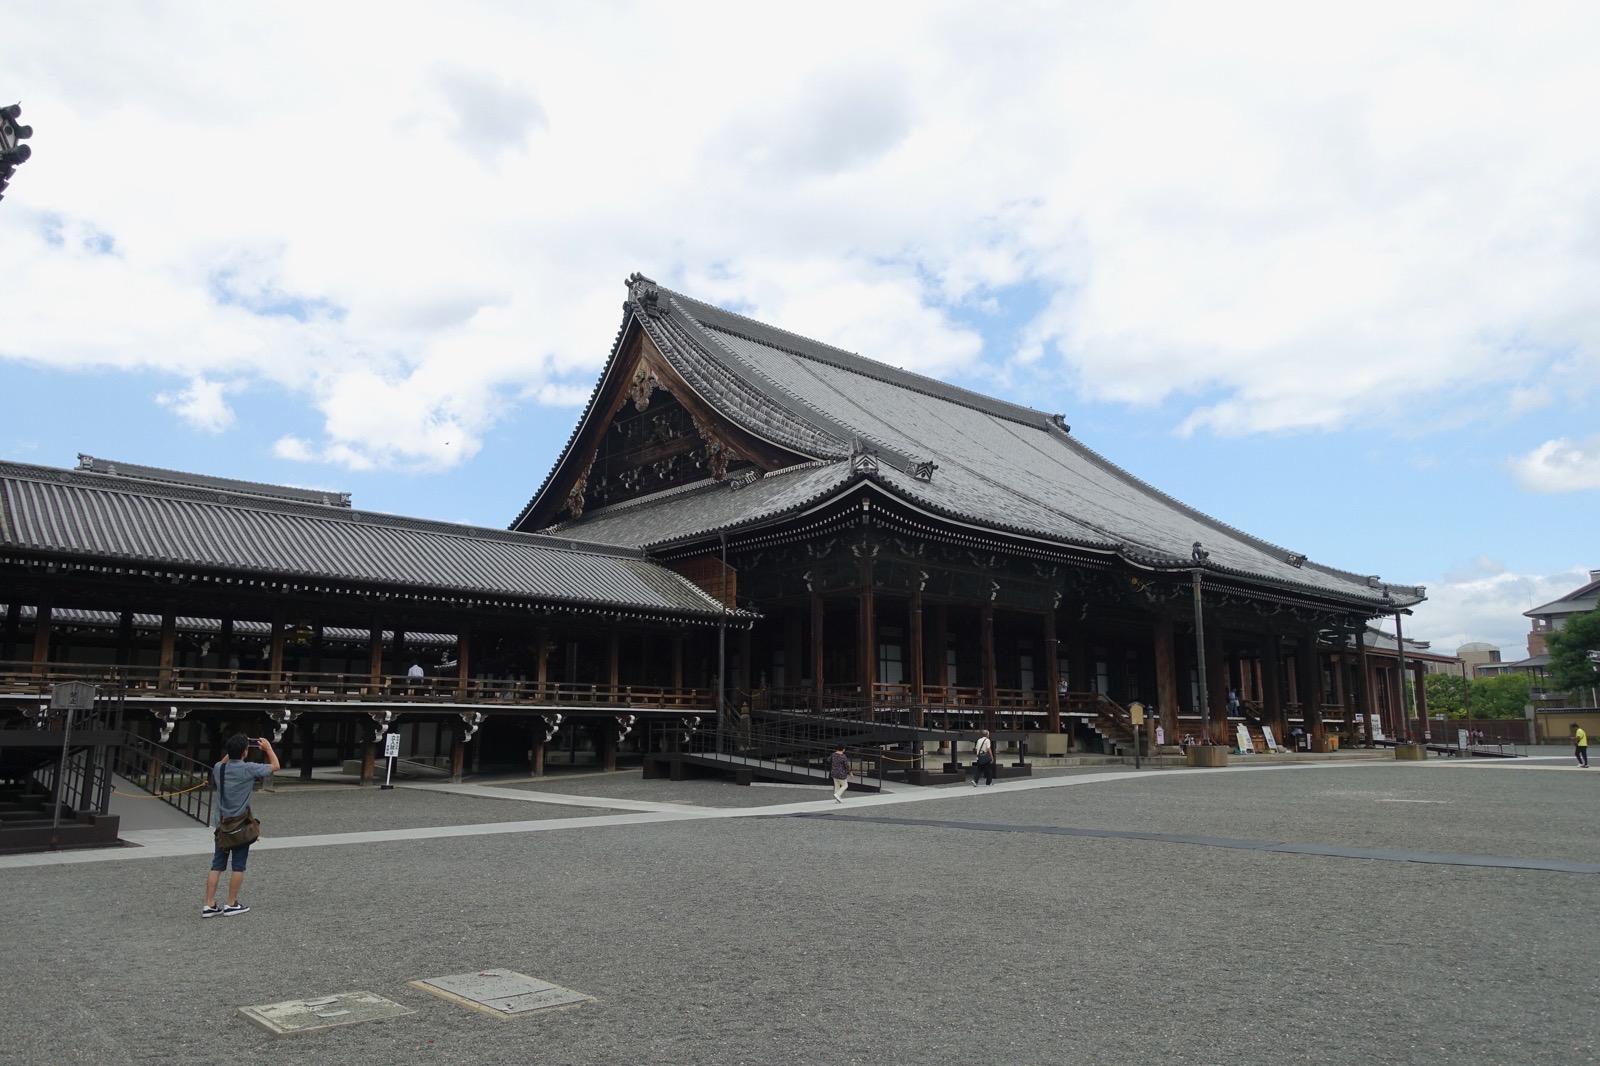 西本願寺阿弥陀堂 kyoto